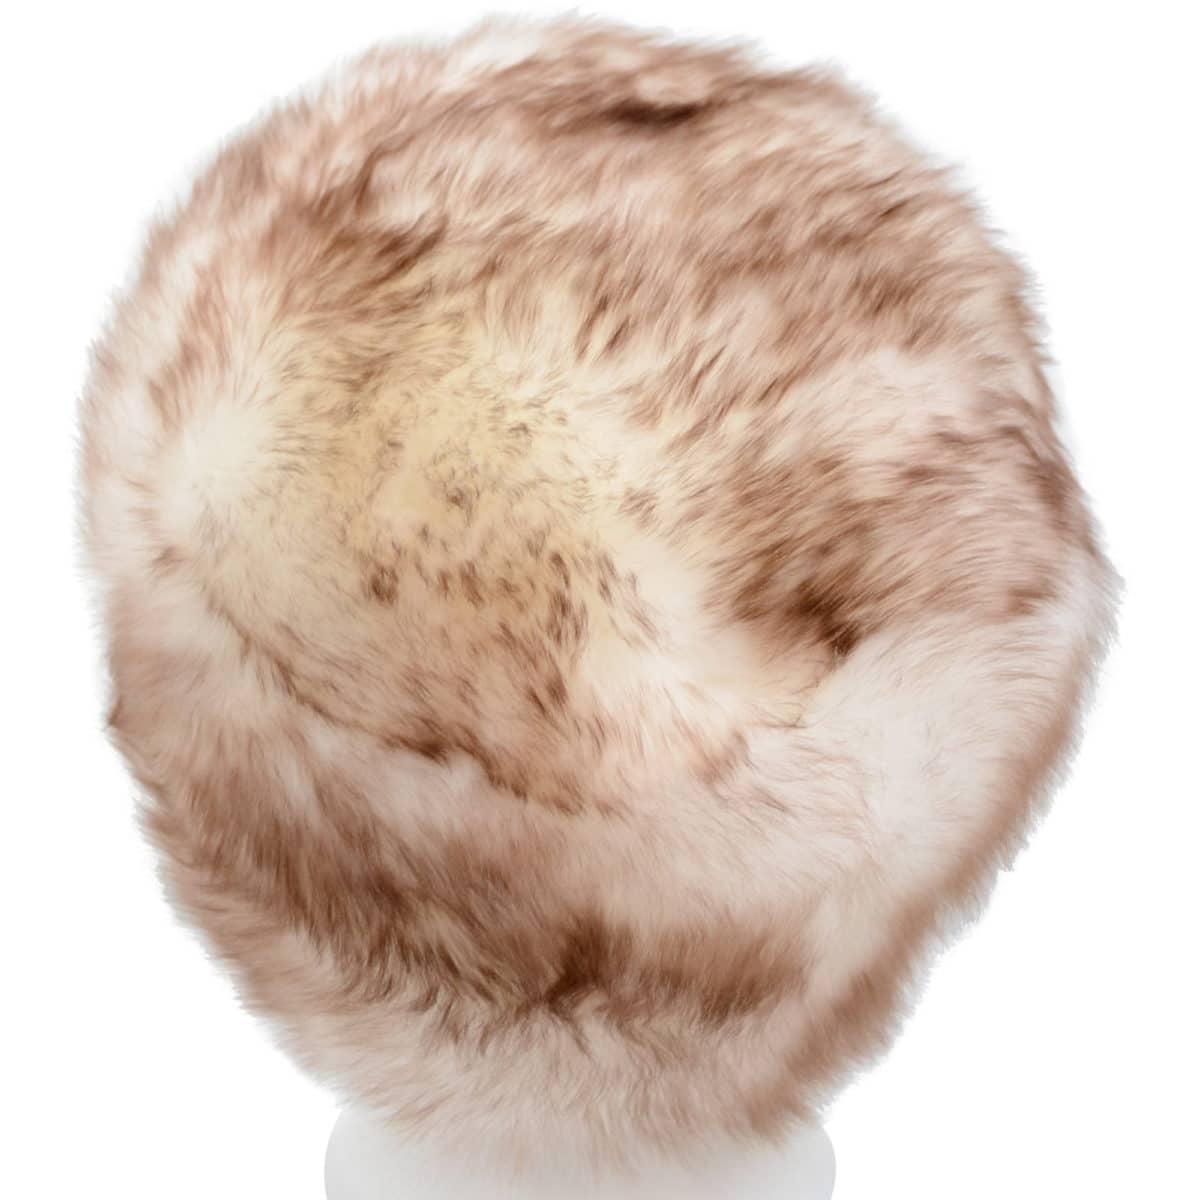 Fern - Ladies Full Sheepskin Hat - Natural Tipped